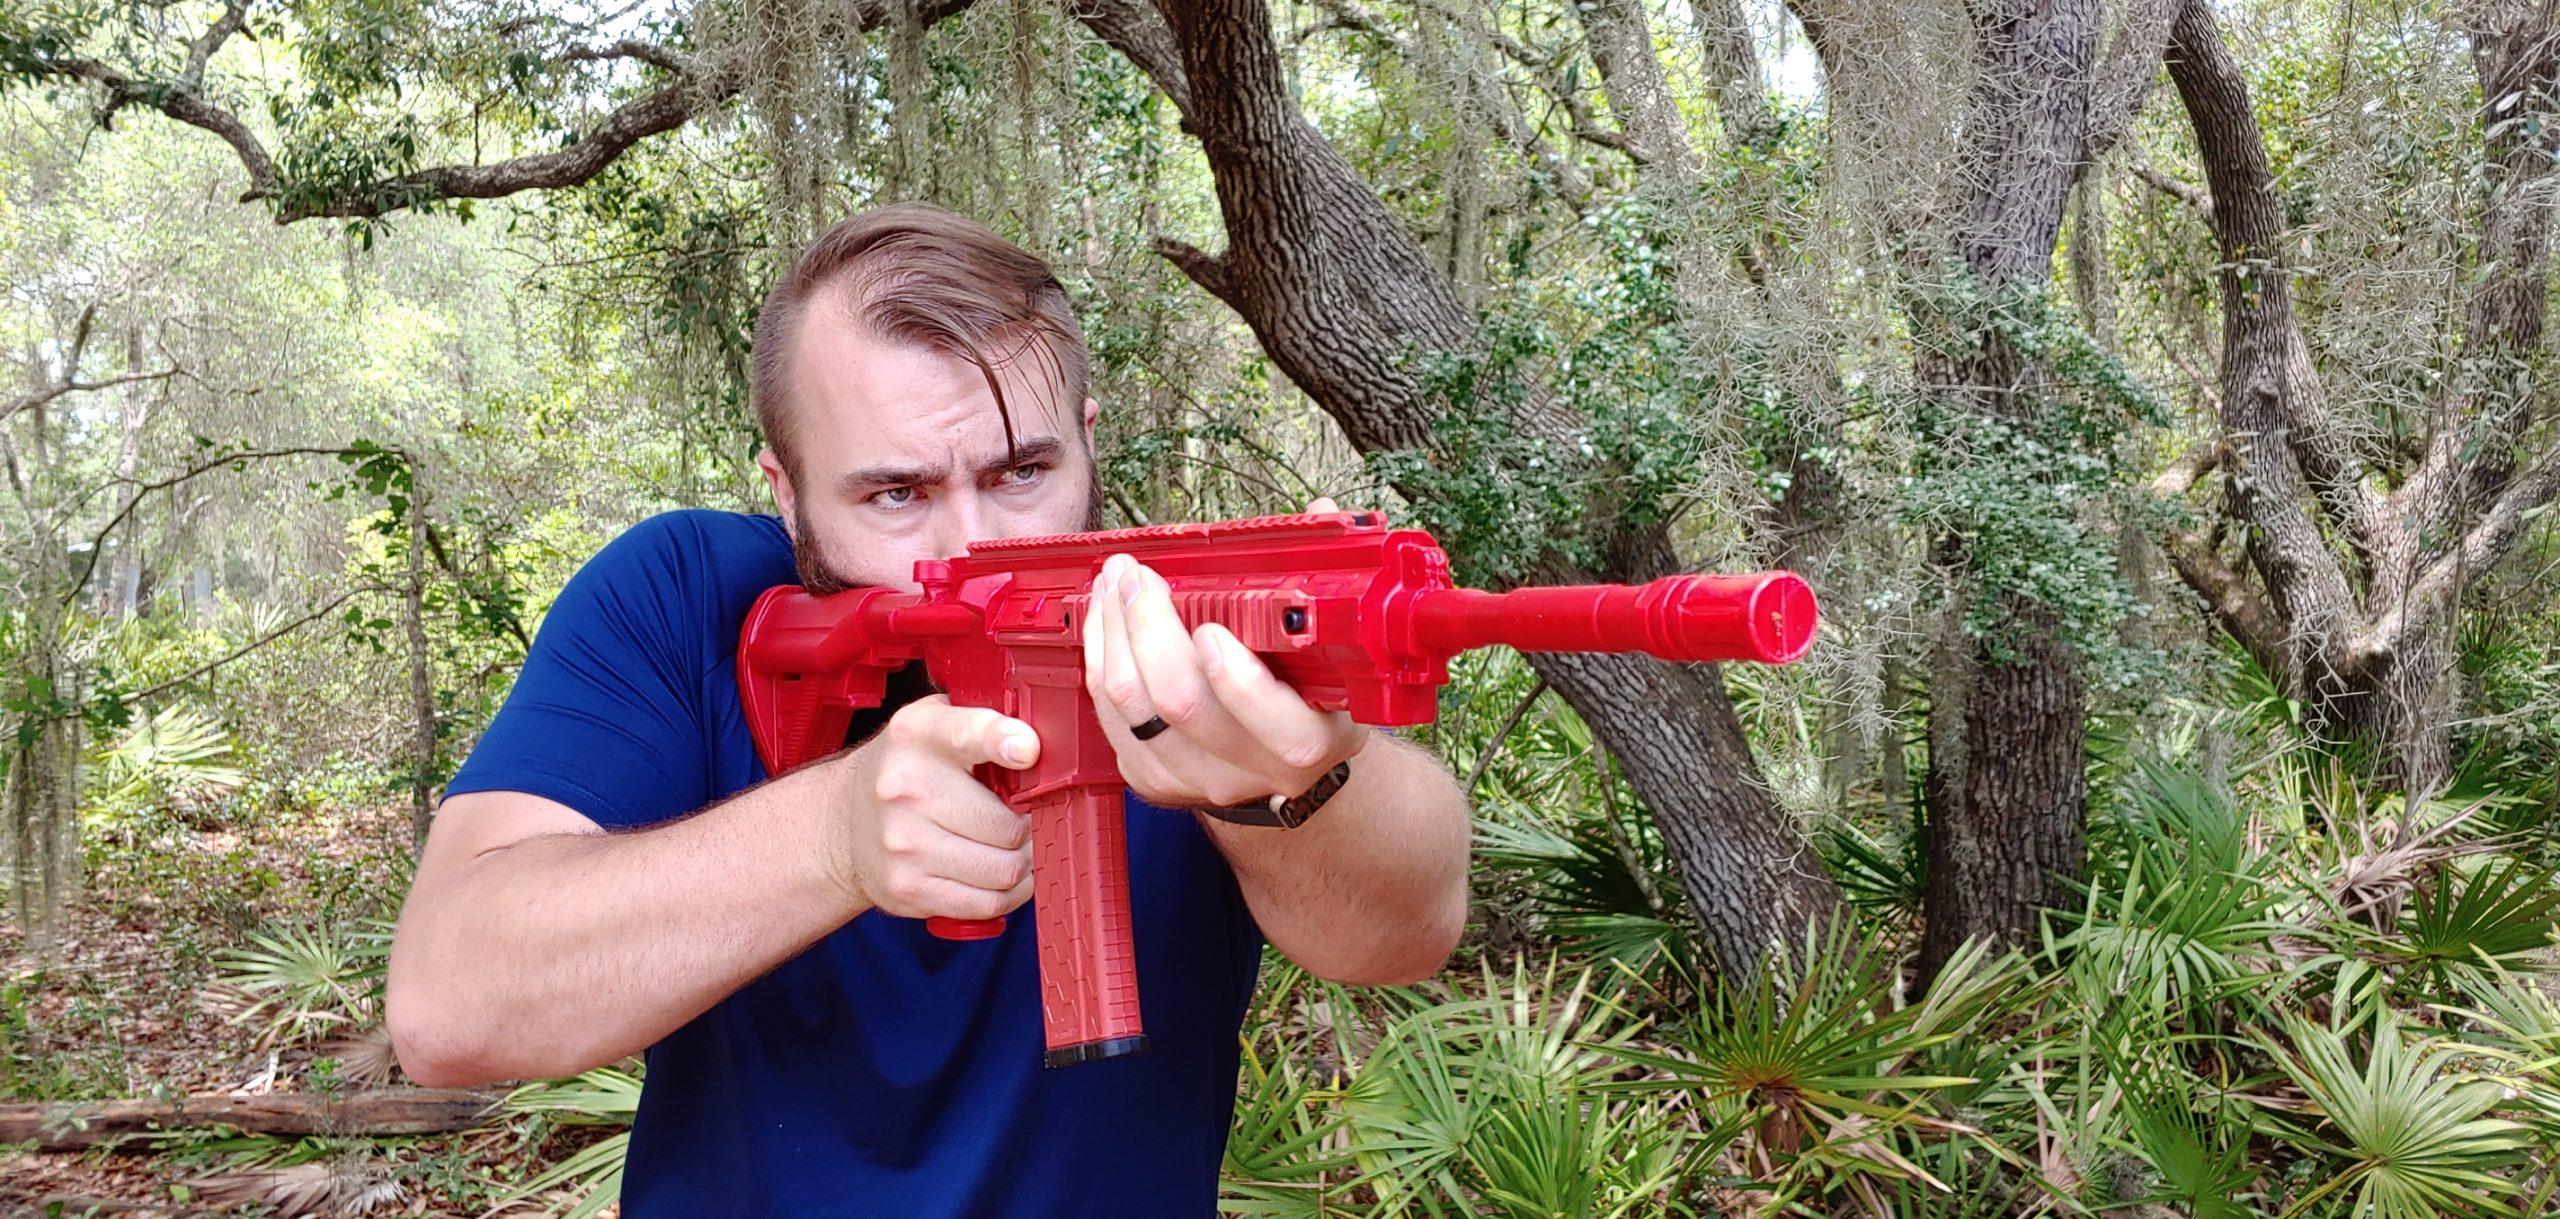 Travis Pike with ASP Enhanced H&K 416 red training gun